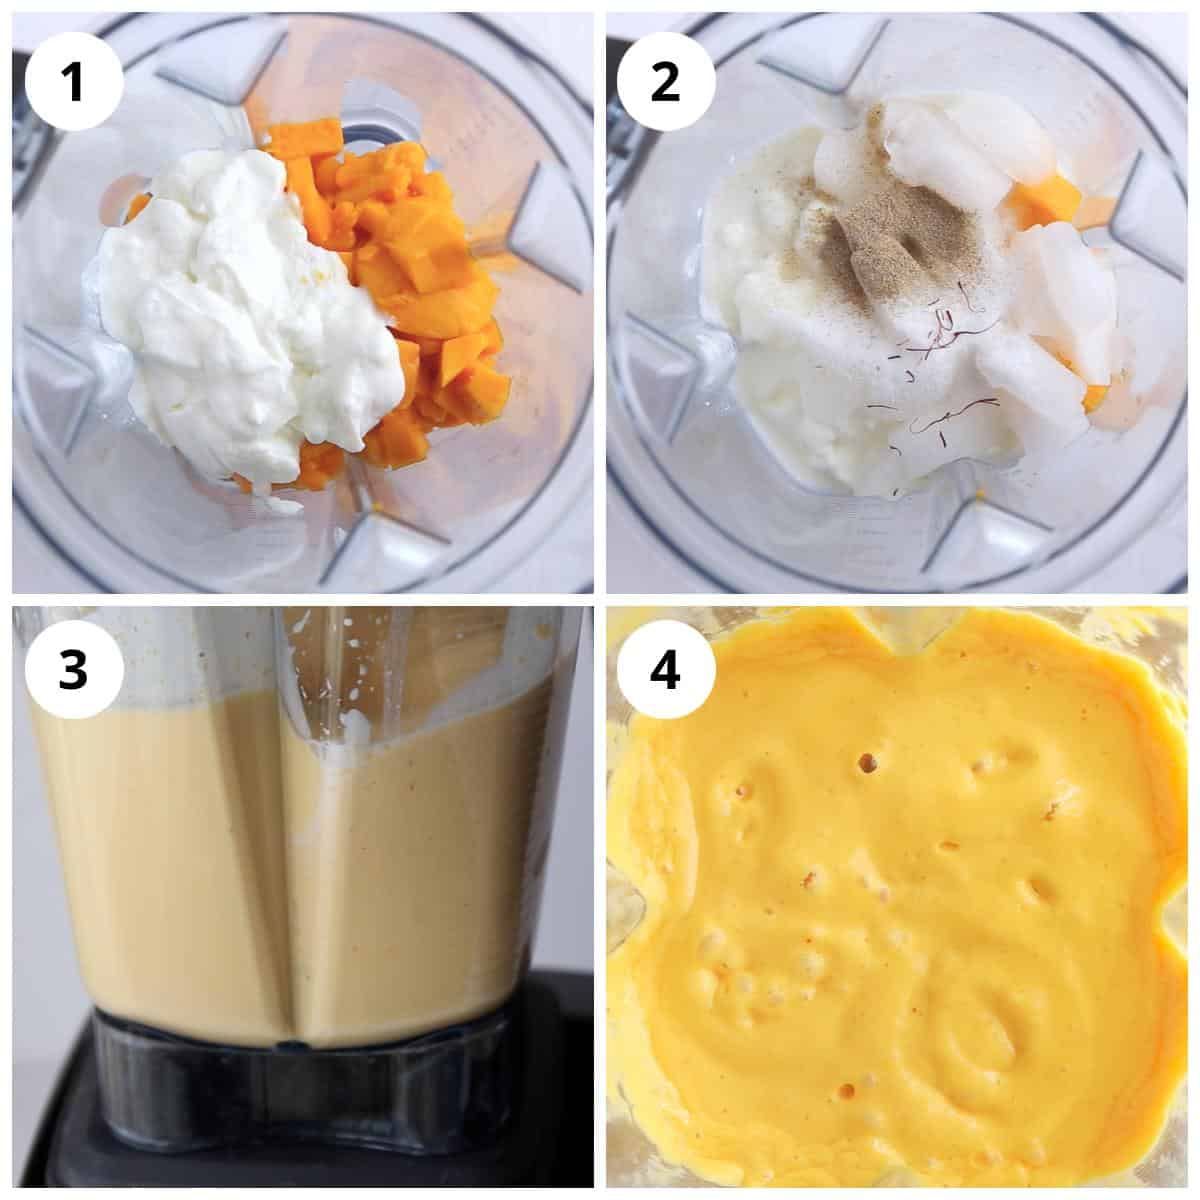 Steps to make mango lassi using blender